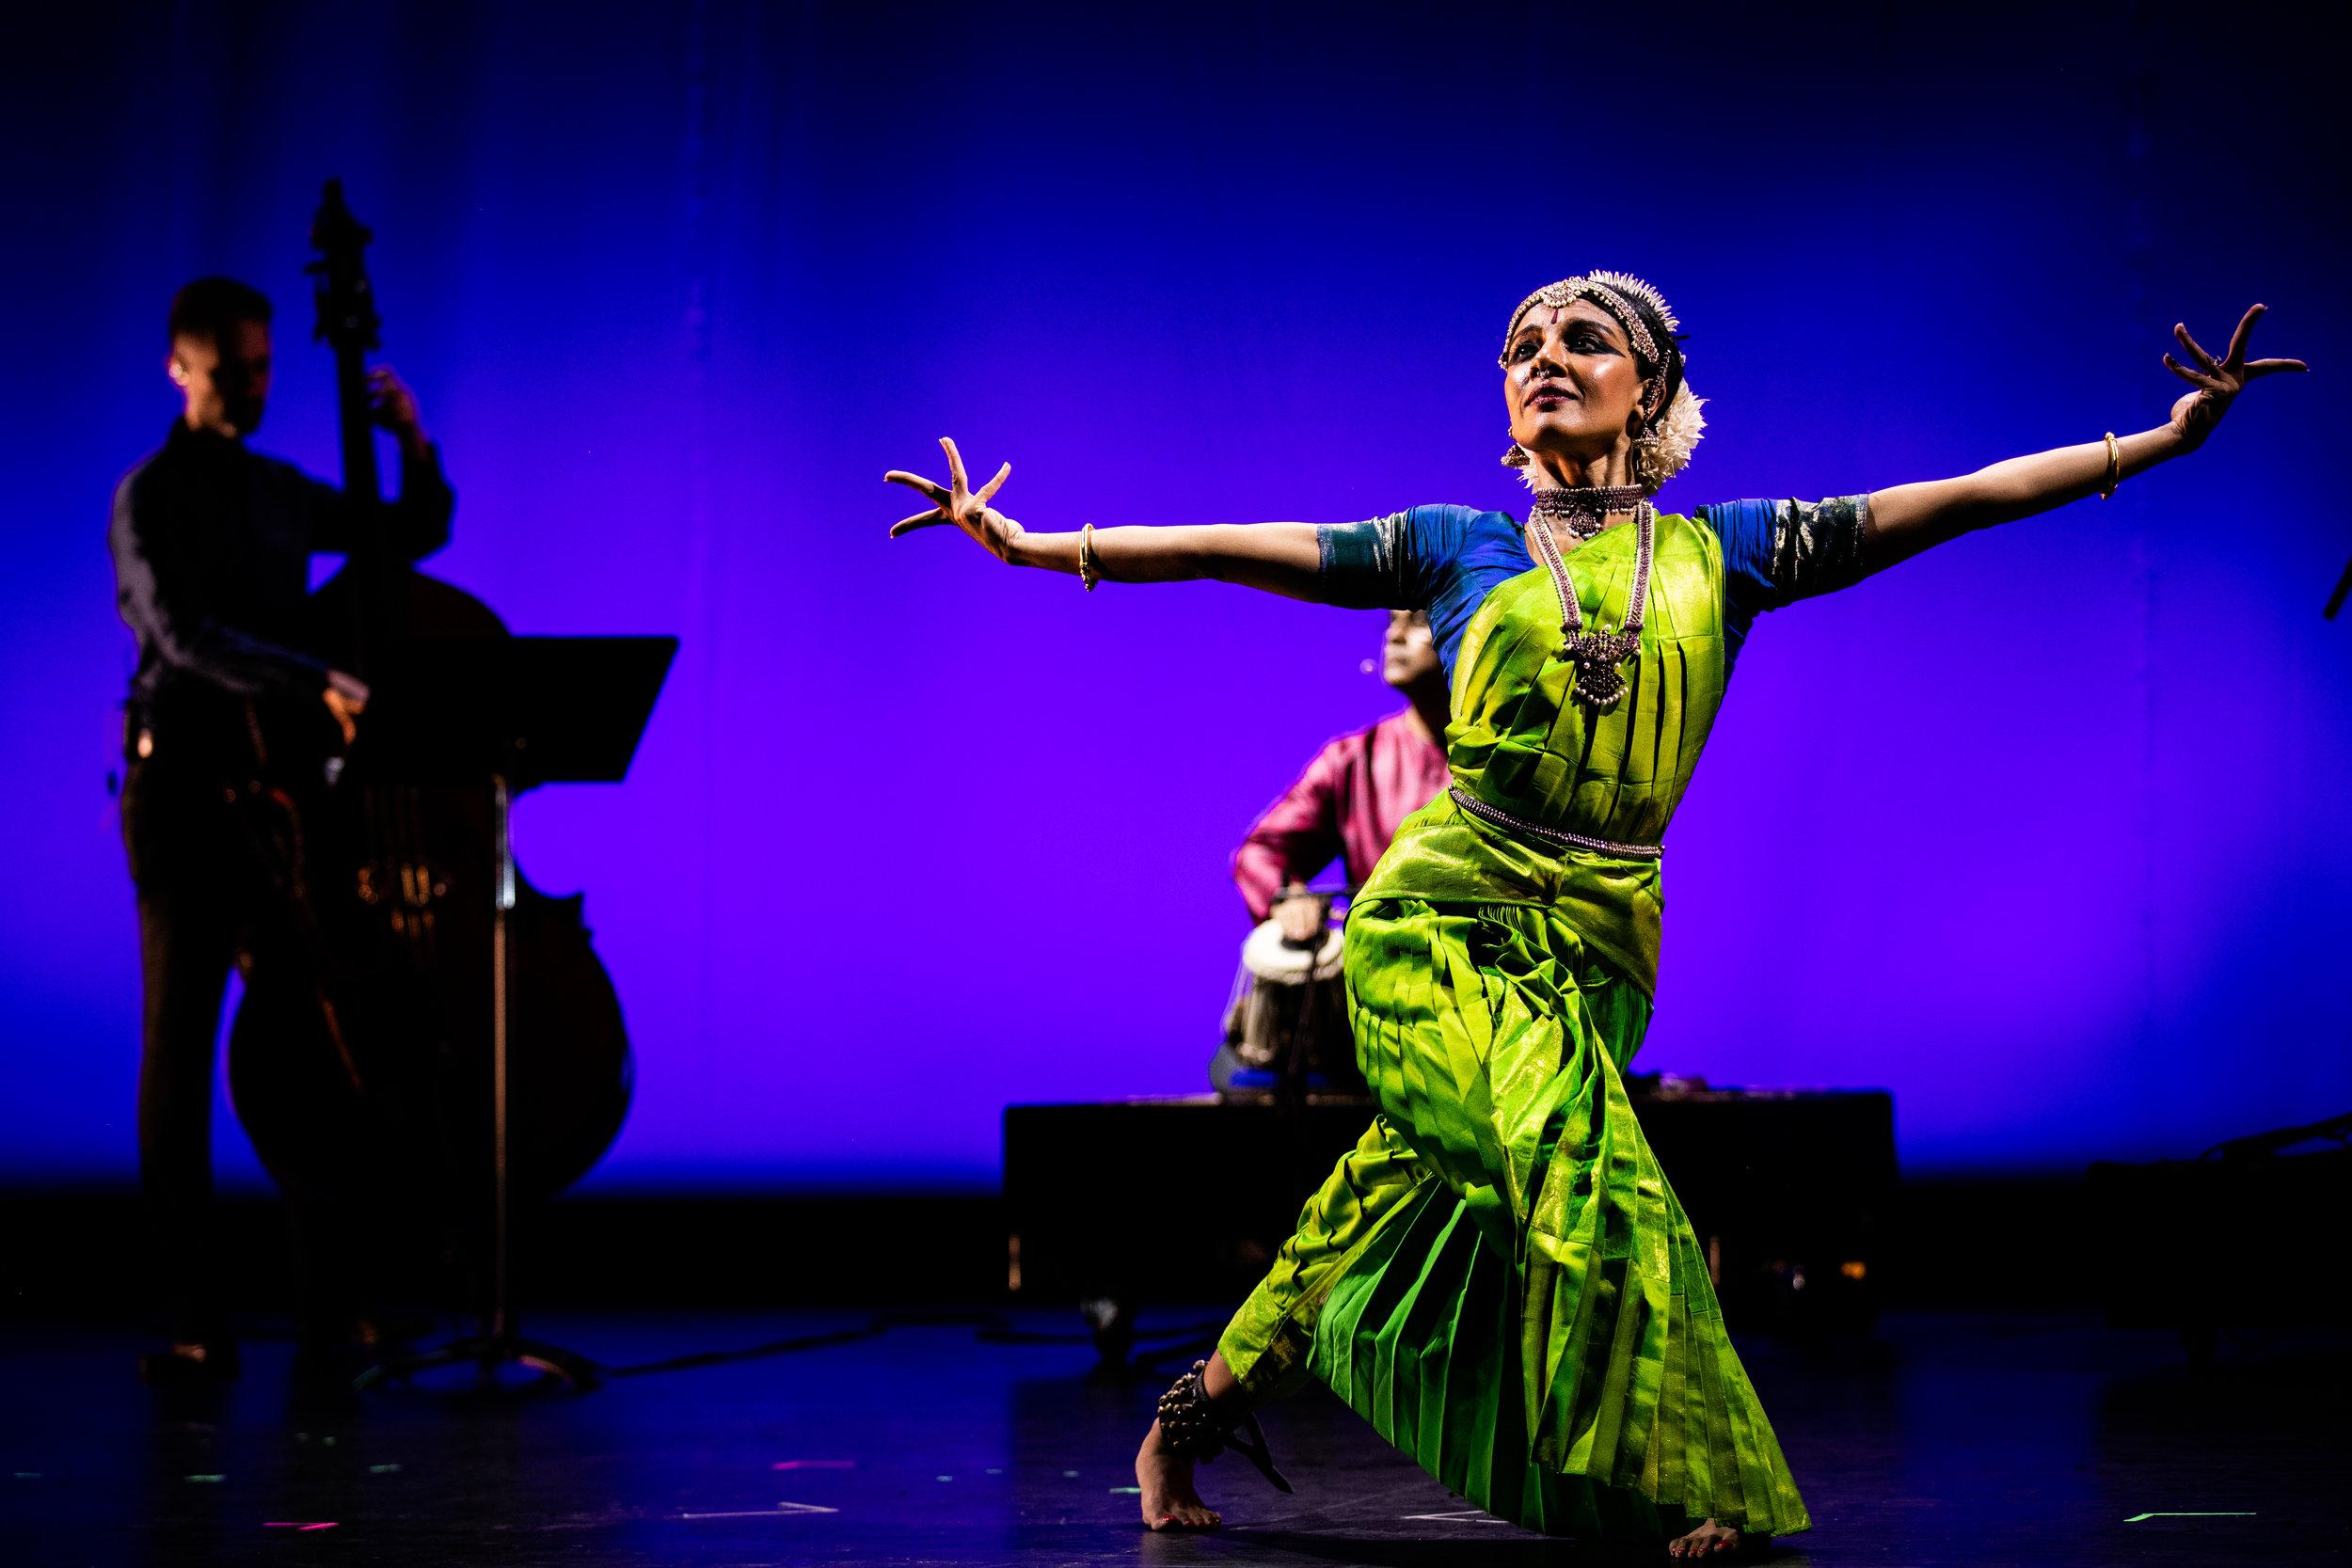 The Silk Road Ensemble at the Granada Theatre in Santa Barbara, California, April 26, 2019.